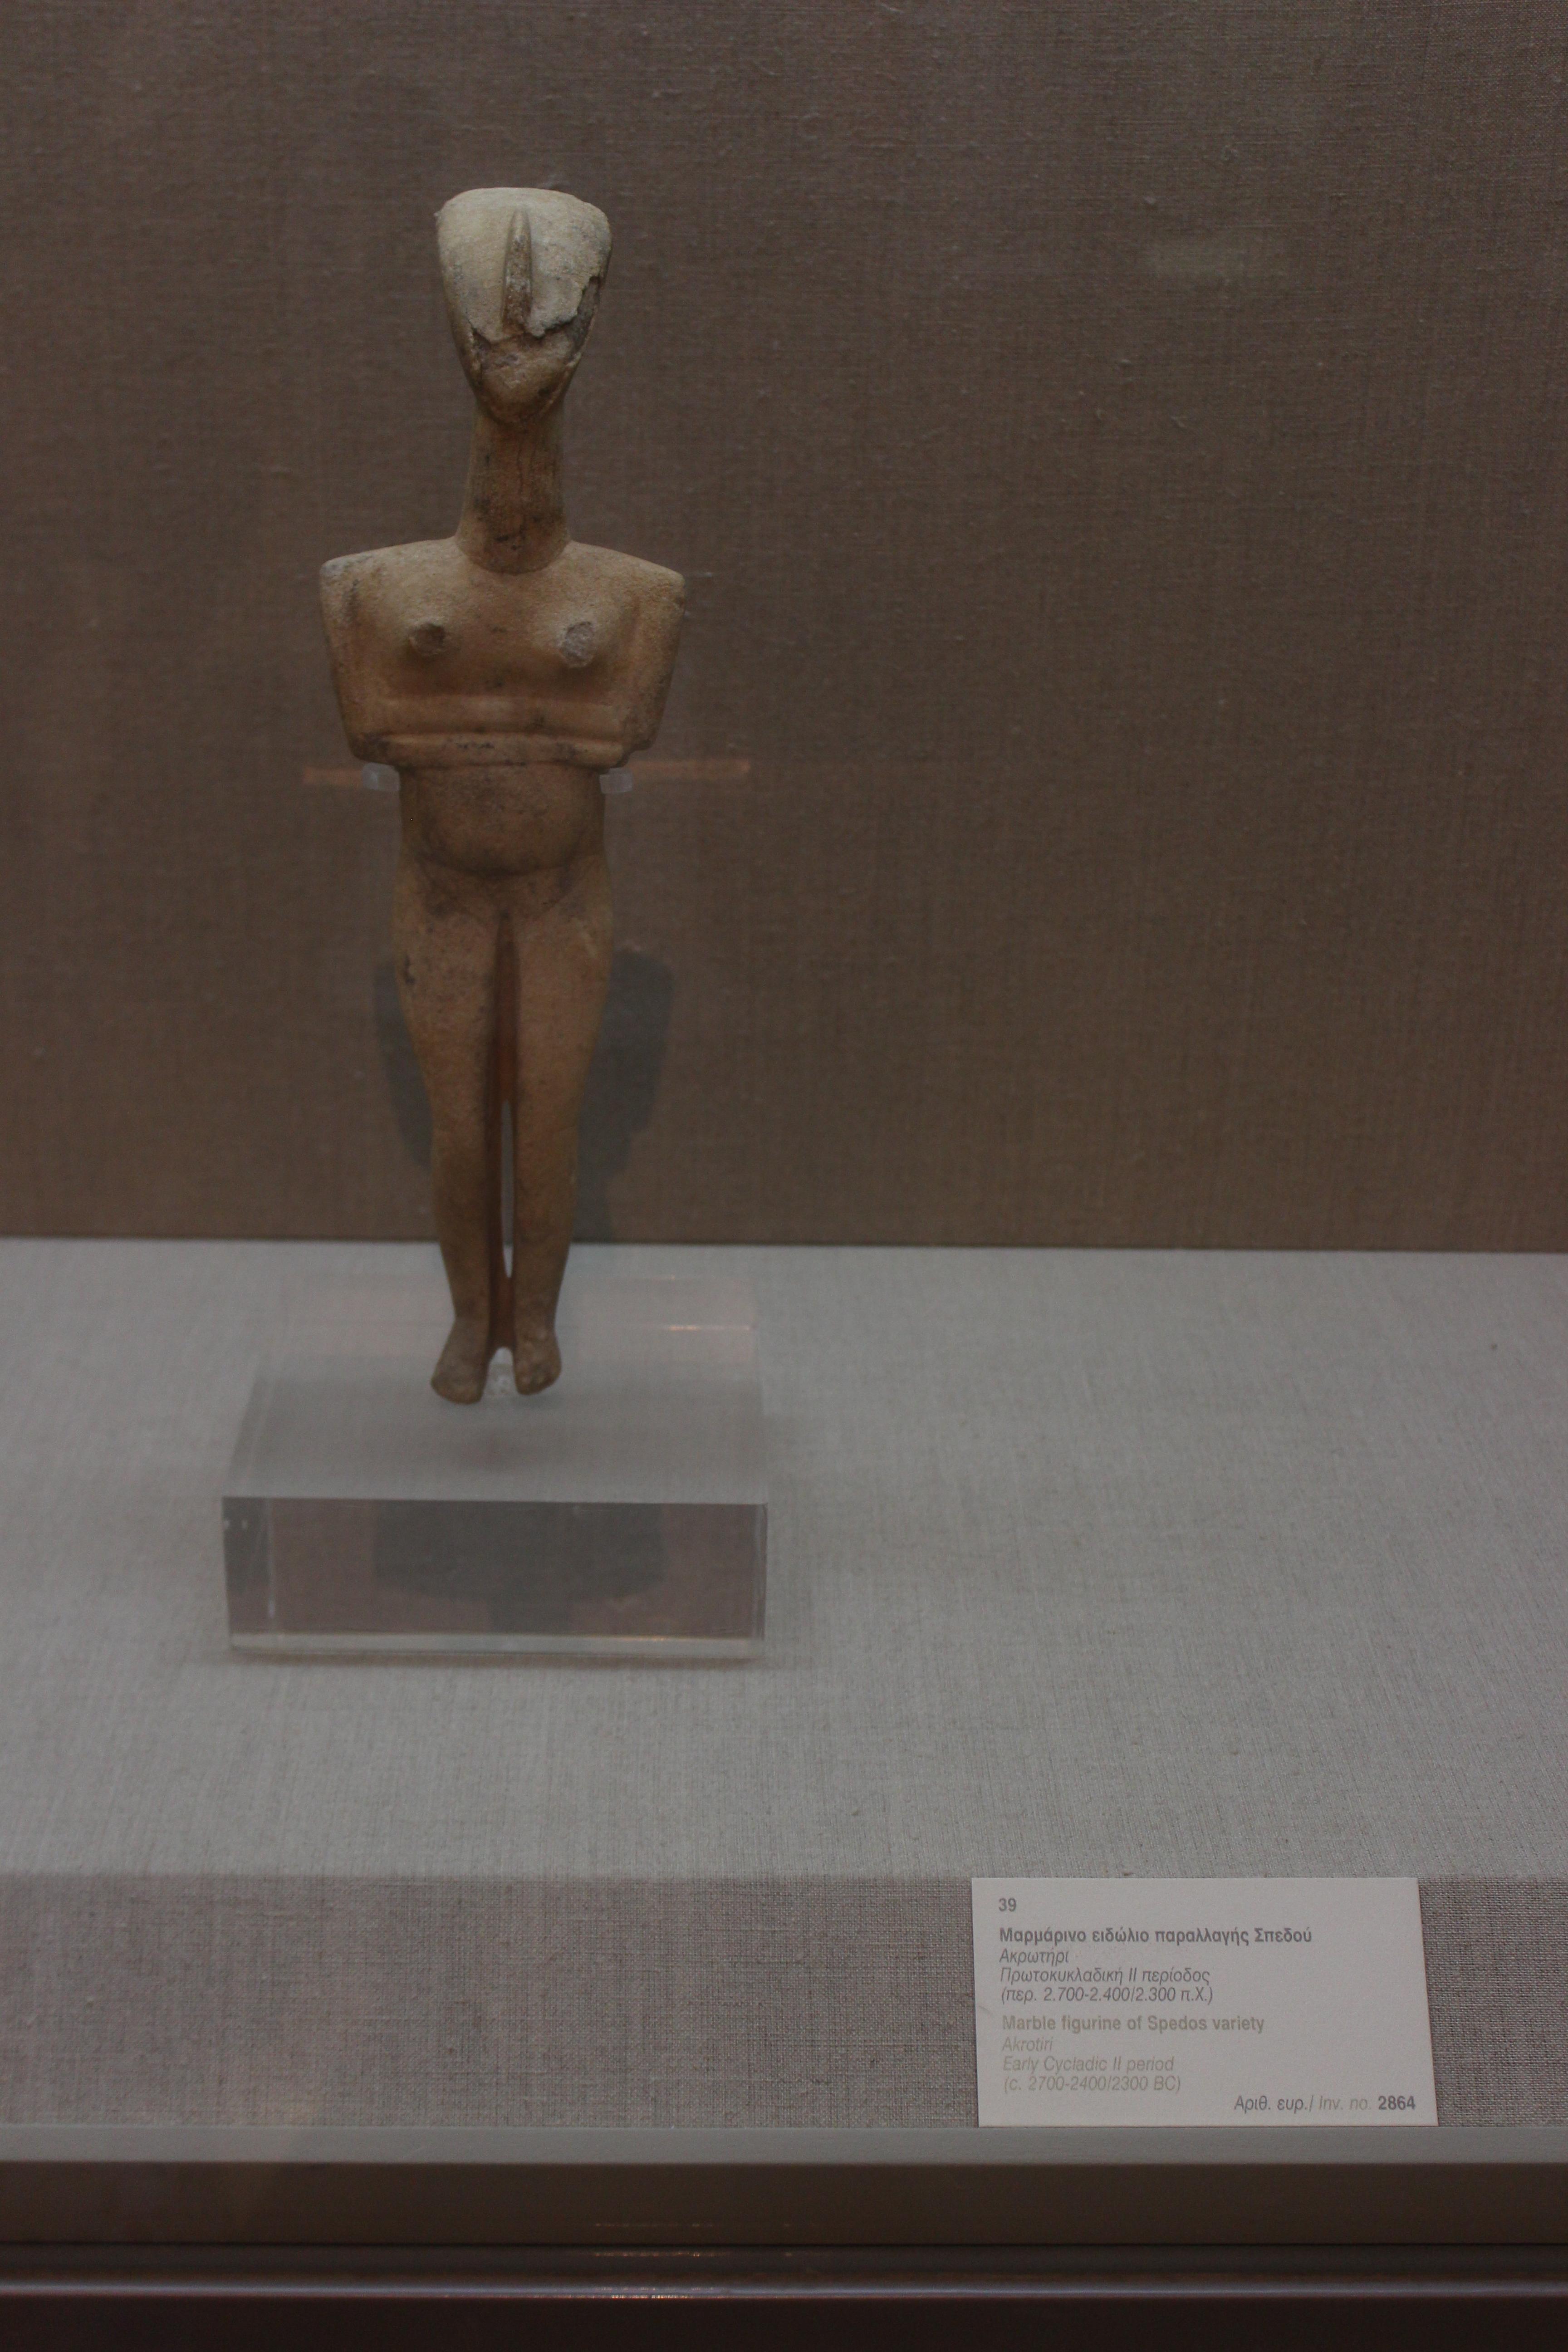 41. Cтатуэтка из мрамора (тип Спедос) - 2700-2400/2300 гг. до н.э., Акротири (Ακρωτήρι). Музей Фиры, Санторини